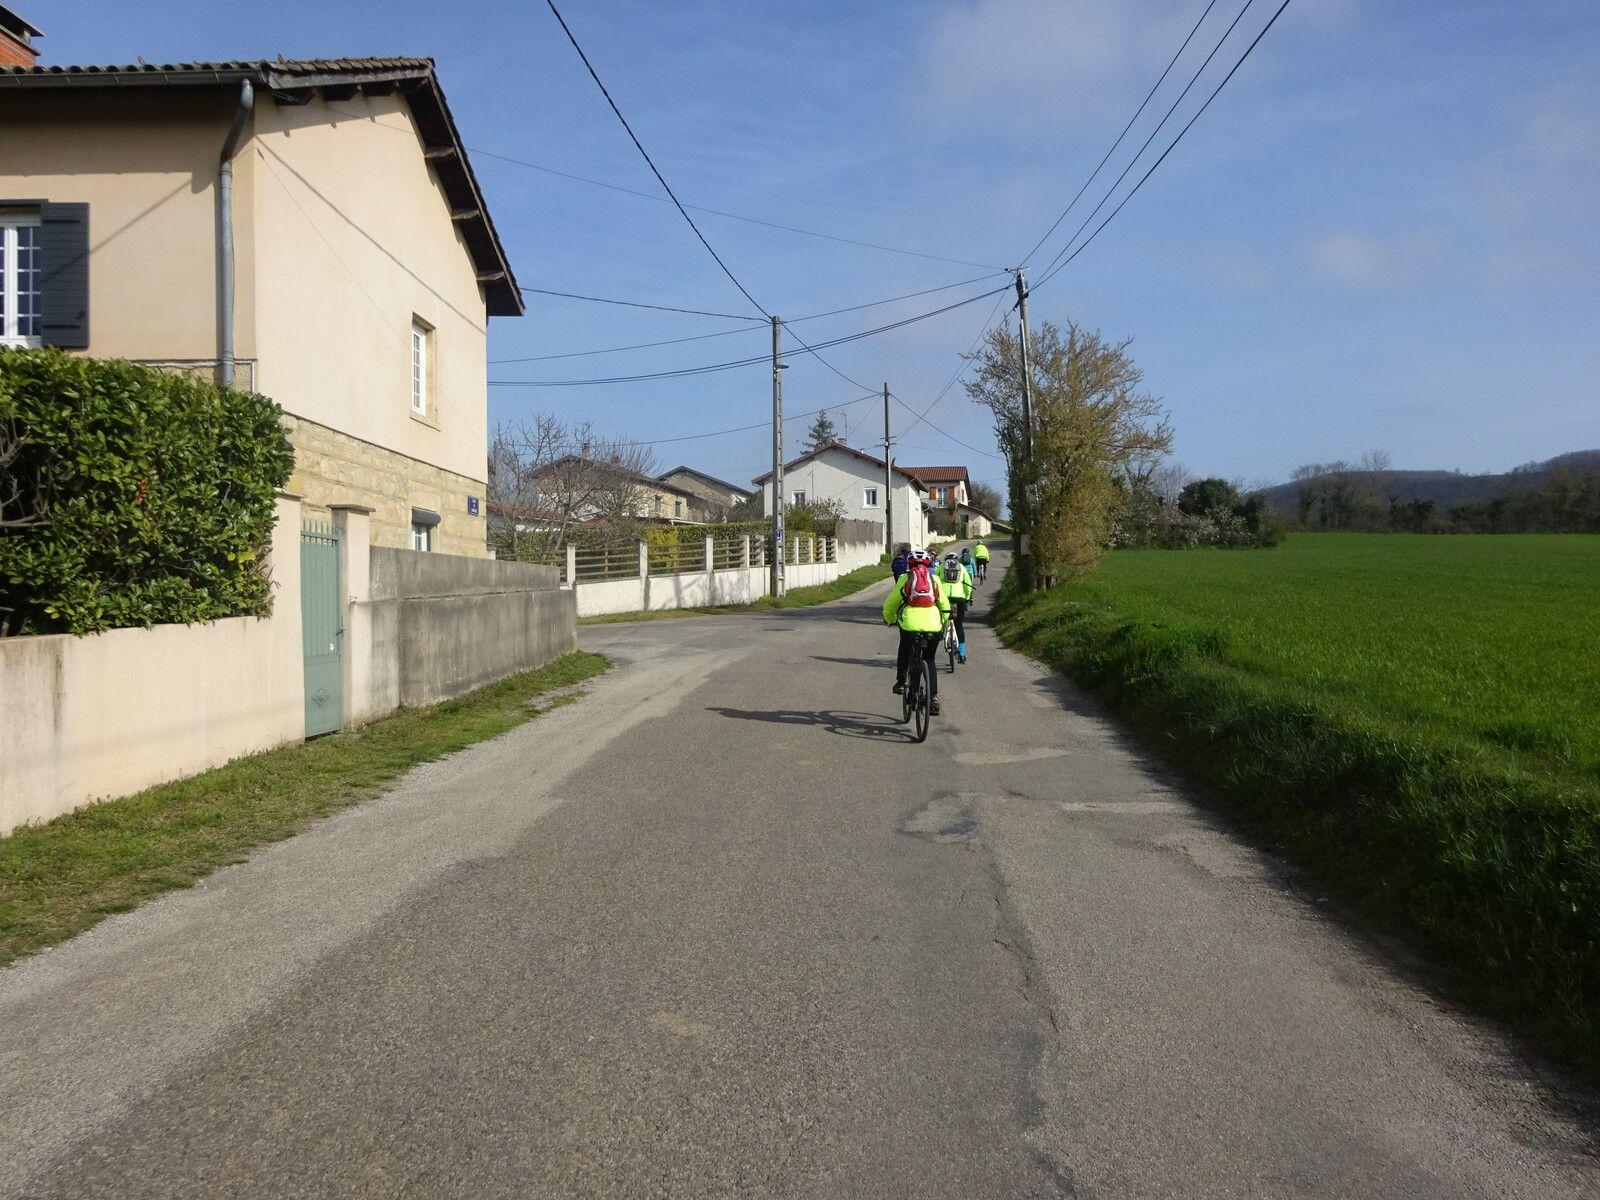 Frontonas - Sortie Promeneurs 1 - Lundi 22 mars 2021